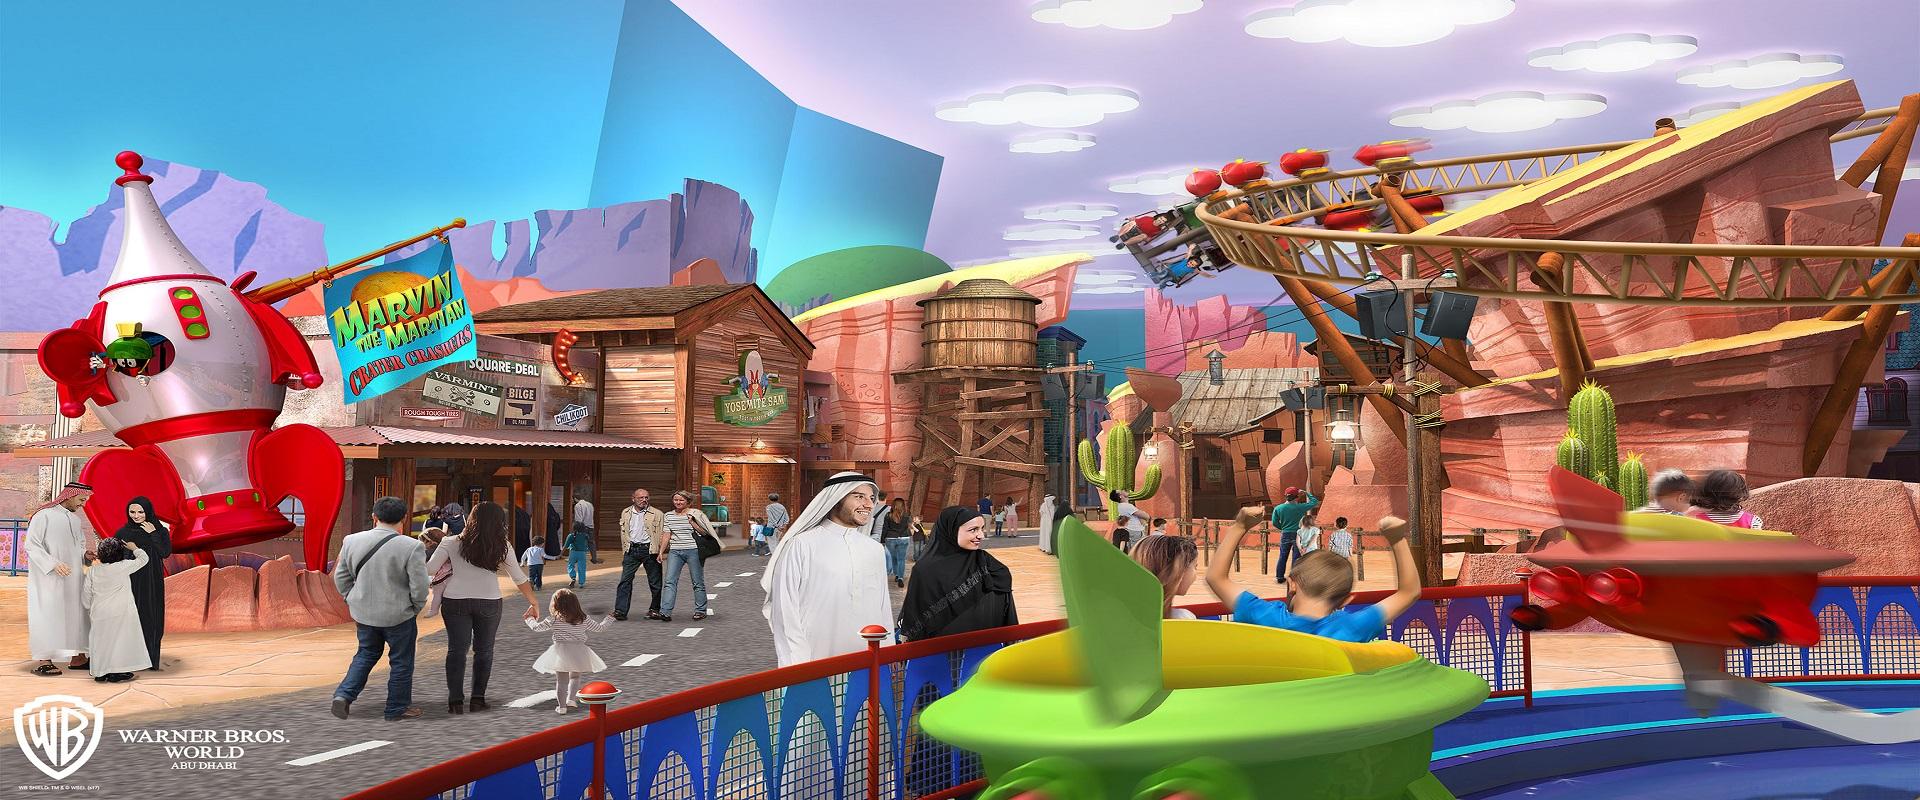 Warner Bros World - Abu Dhabi